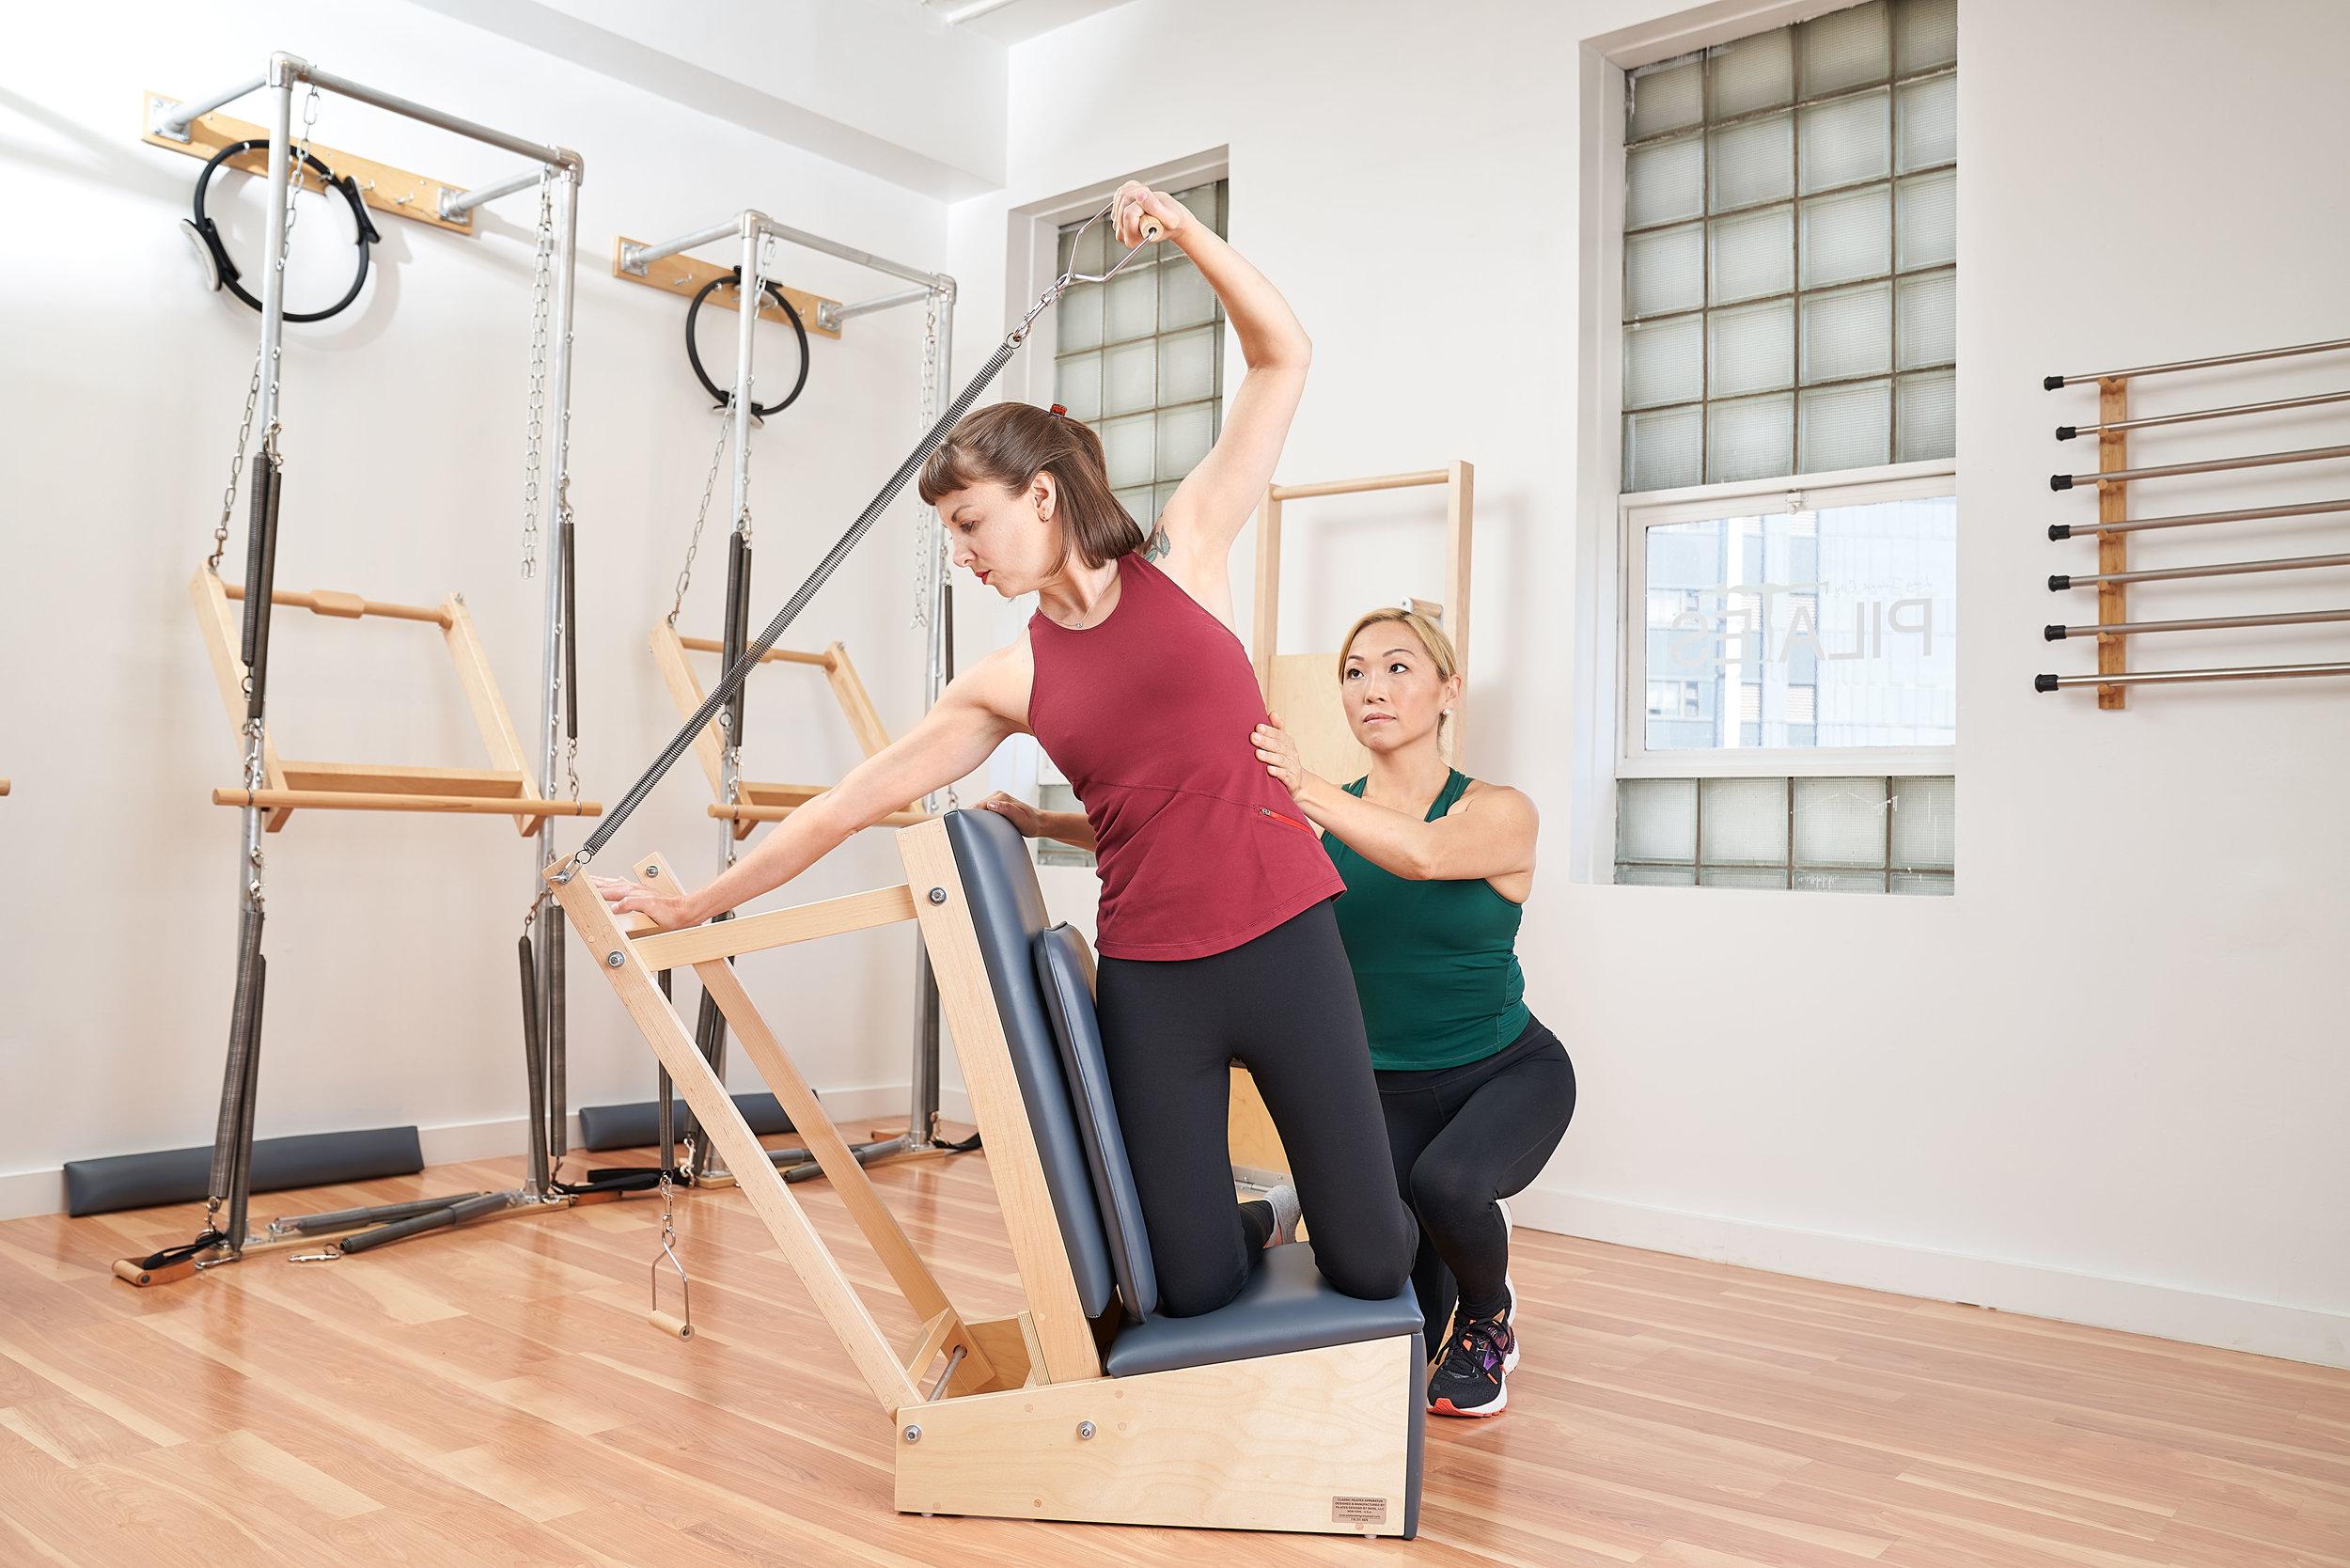 19051_LIC-Pilates-1416.jpg